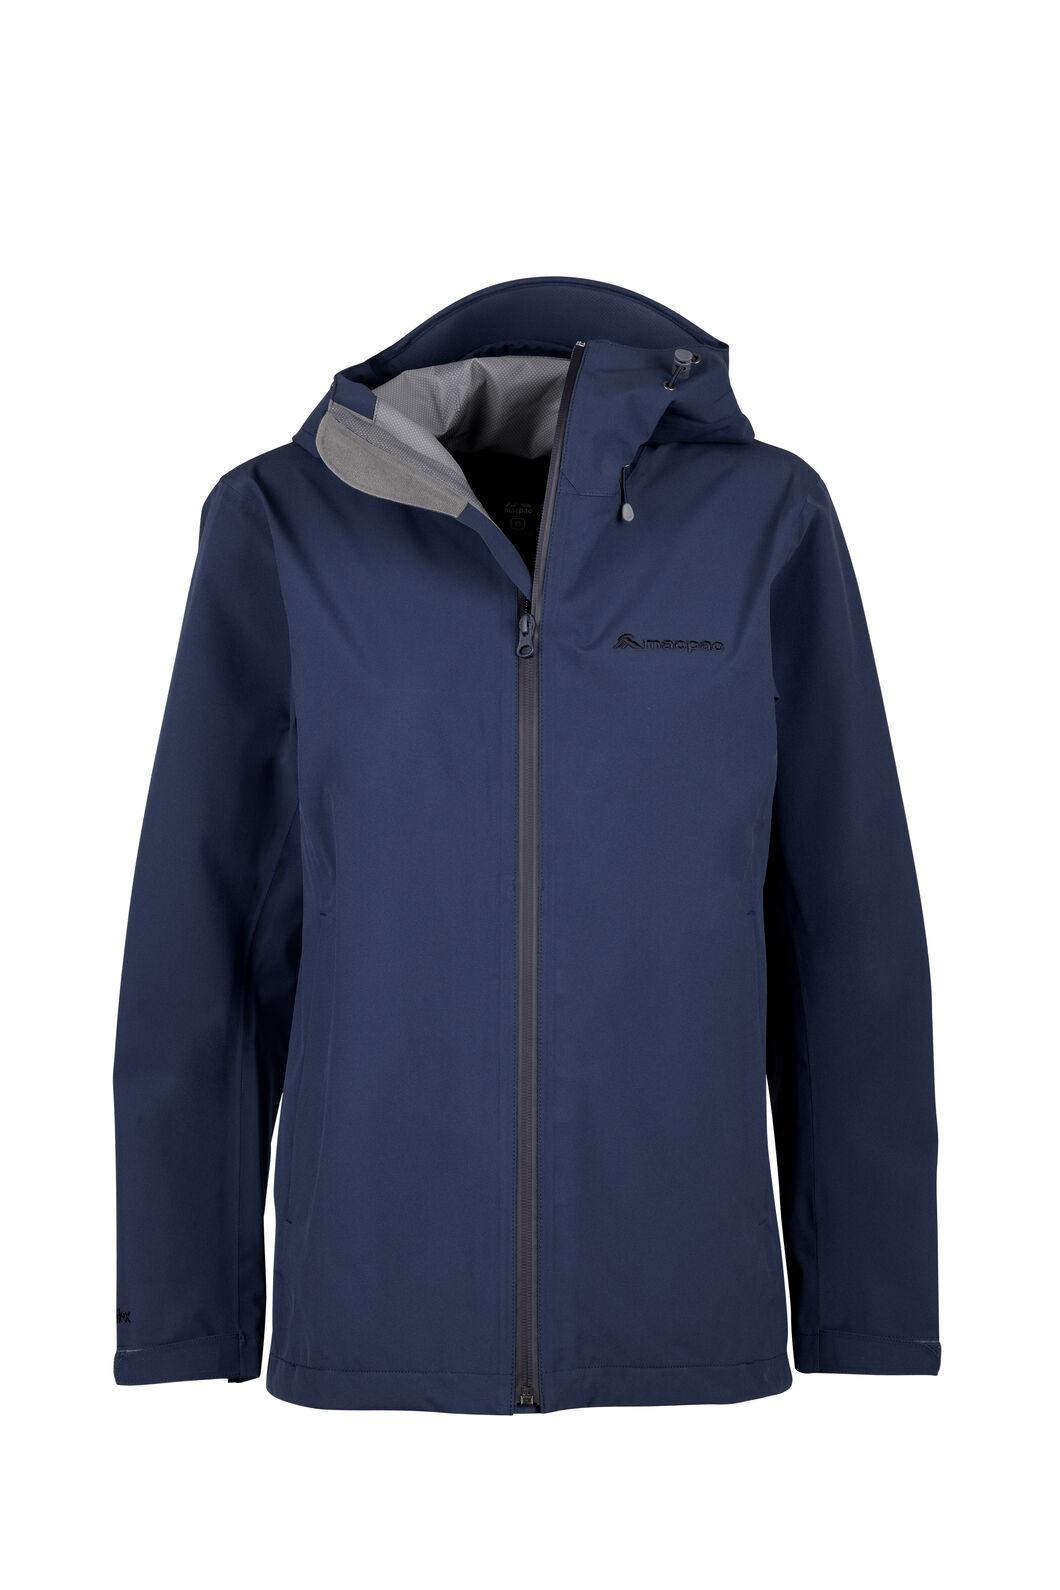 Macpac Women's Dispatch Rain Jacket, Black Iris, hi-res